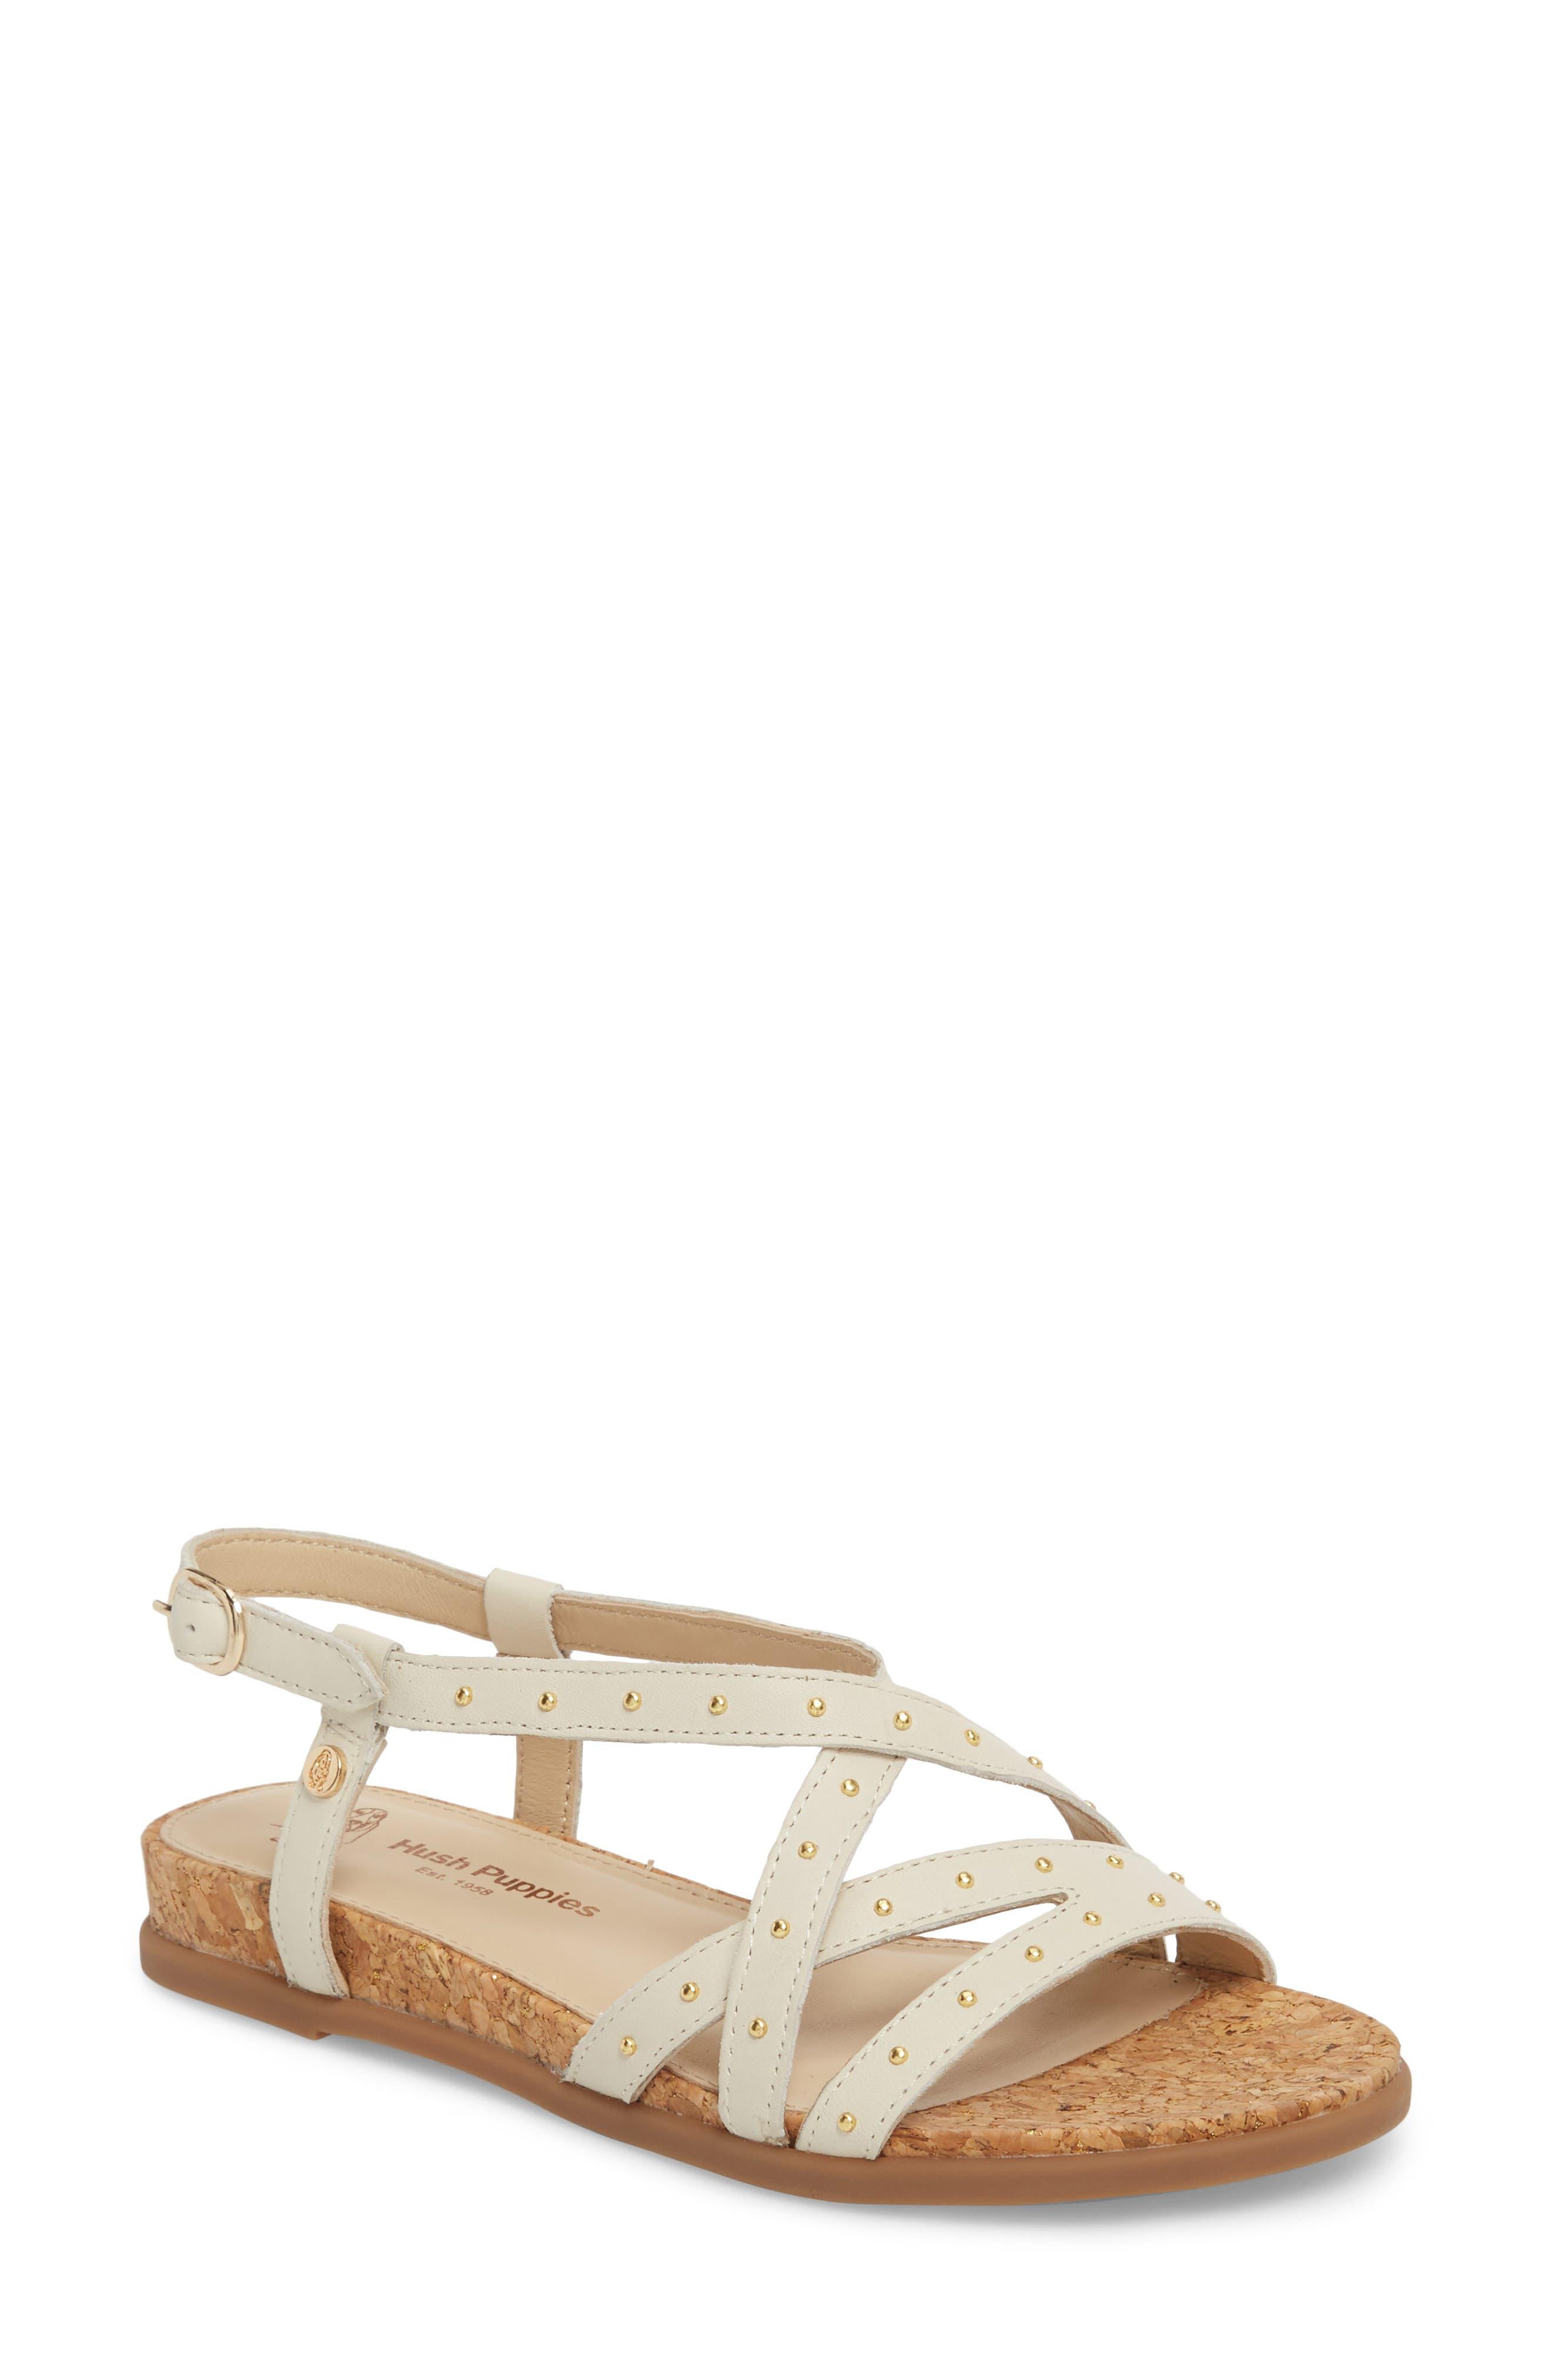 Dalmatian Studded Sandal,                         Main,                         color, Ivory Leather